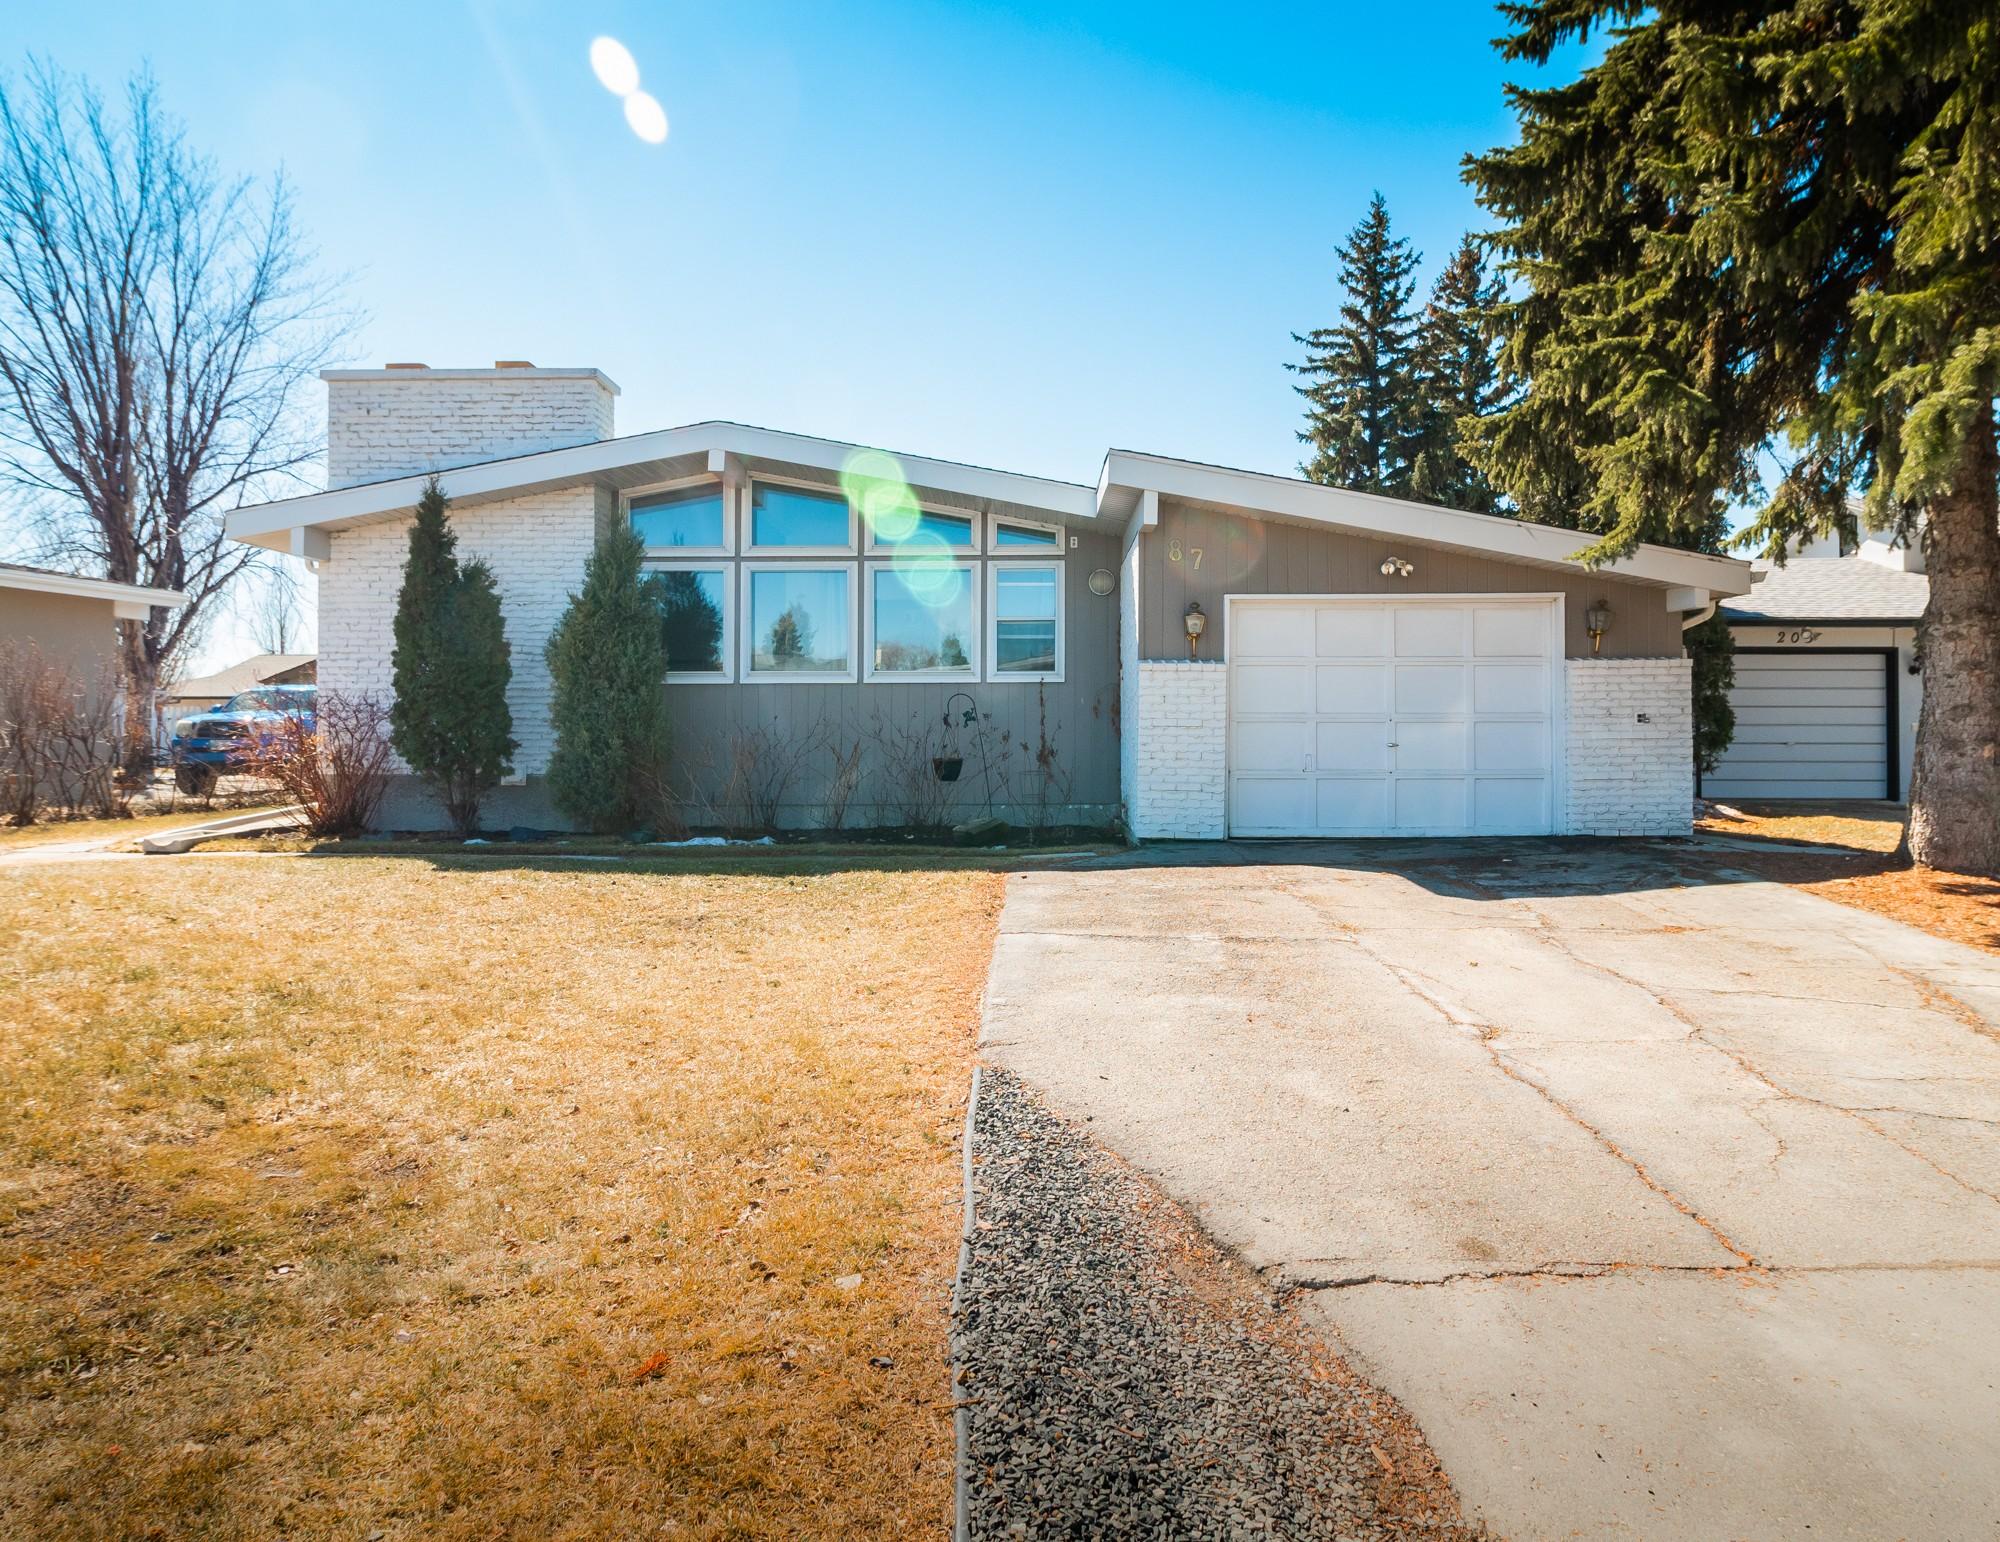 87-tahoe-bay-for-sale-bobby-wall-winnipeg-realtor